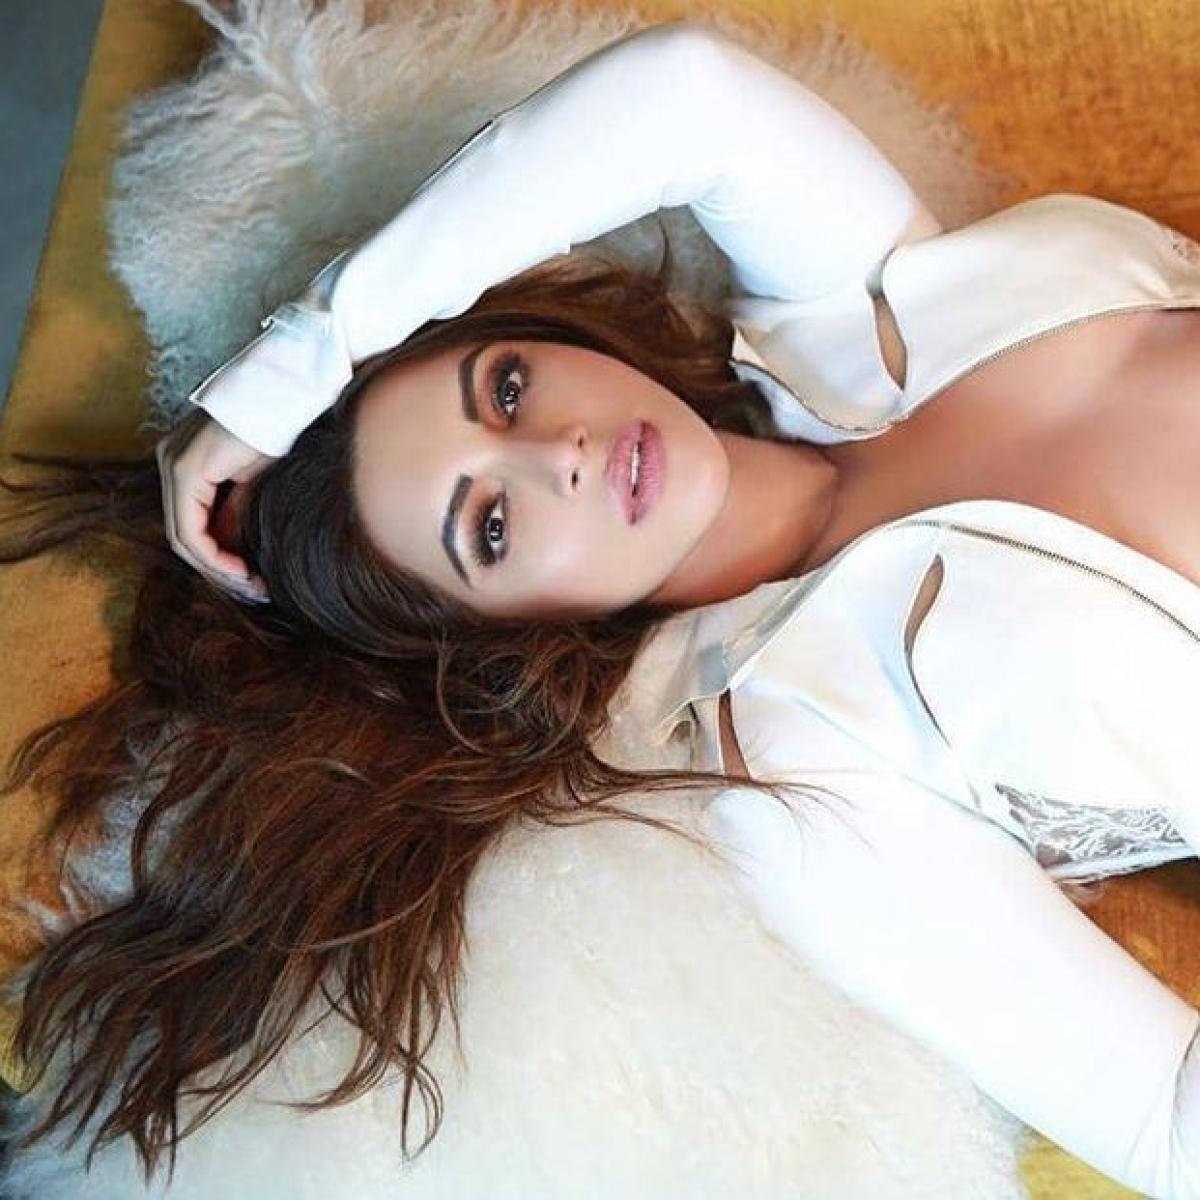 TV actress Shama Sikander says she's had Botox but no plastic surgery